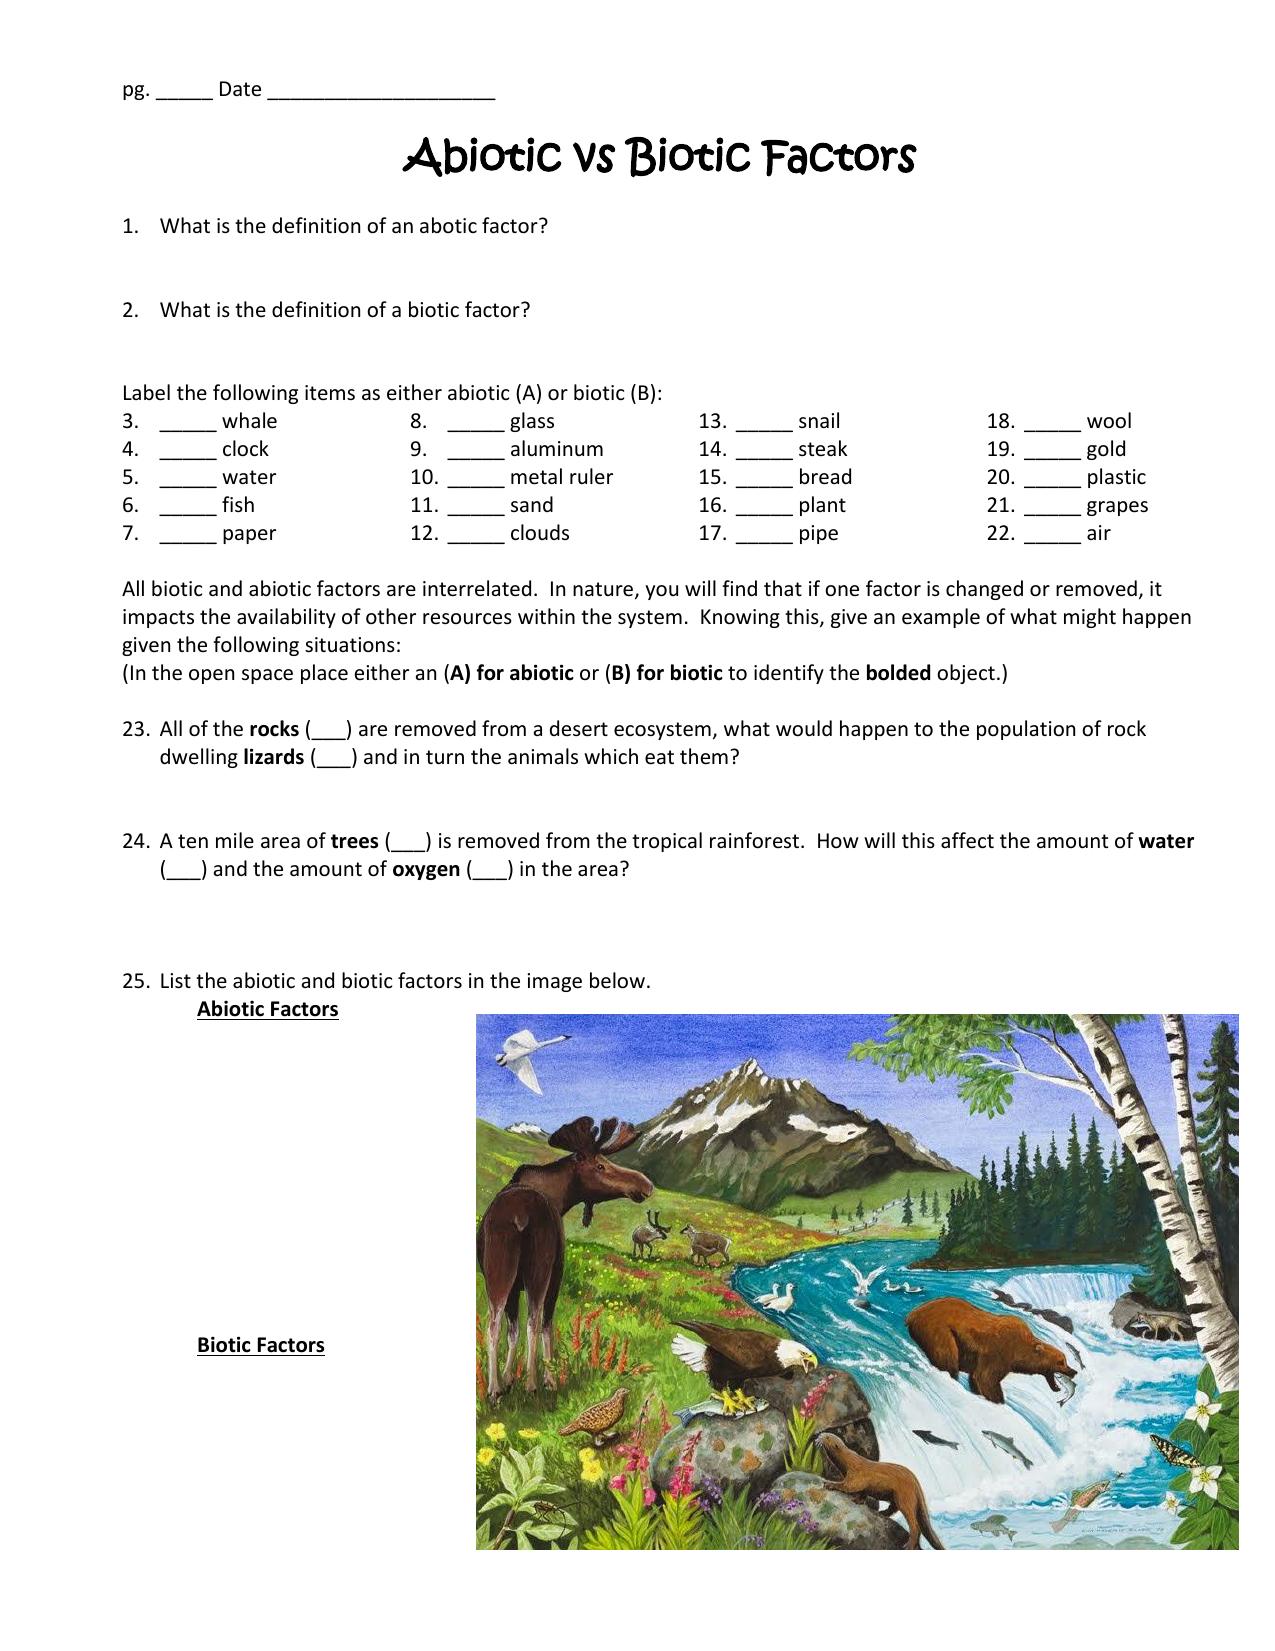 Worksheet 1 Abiotic Versus Biotic Factors